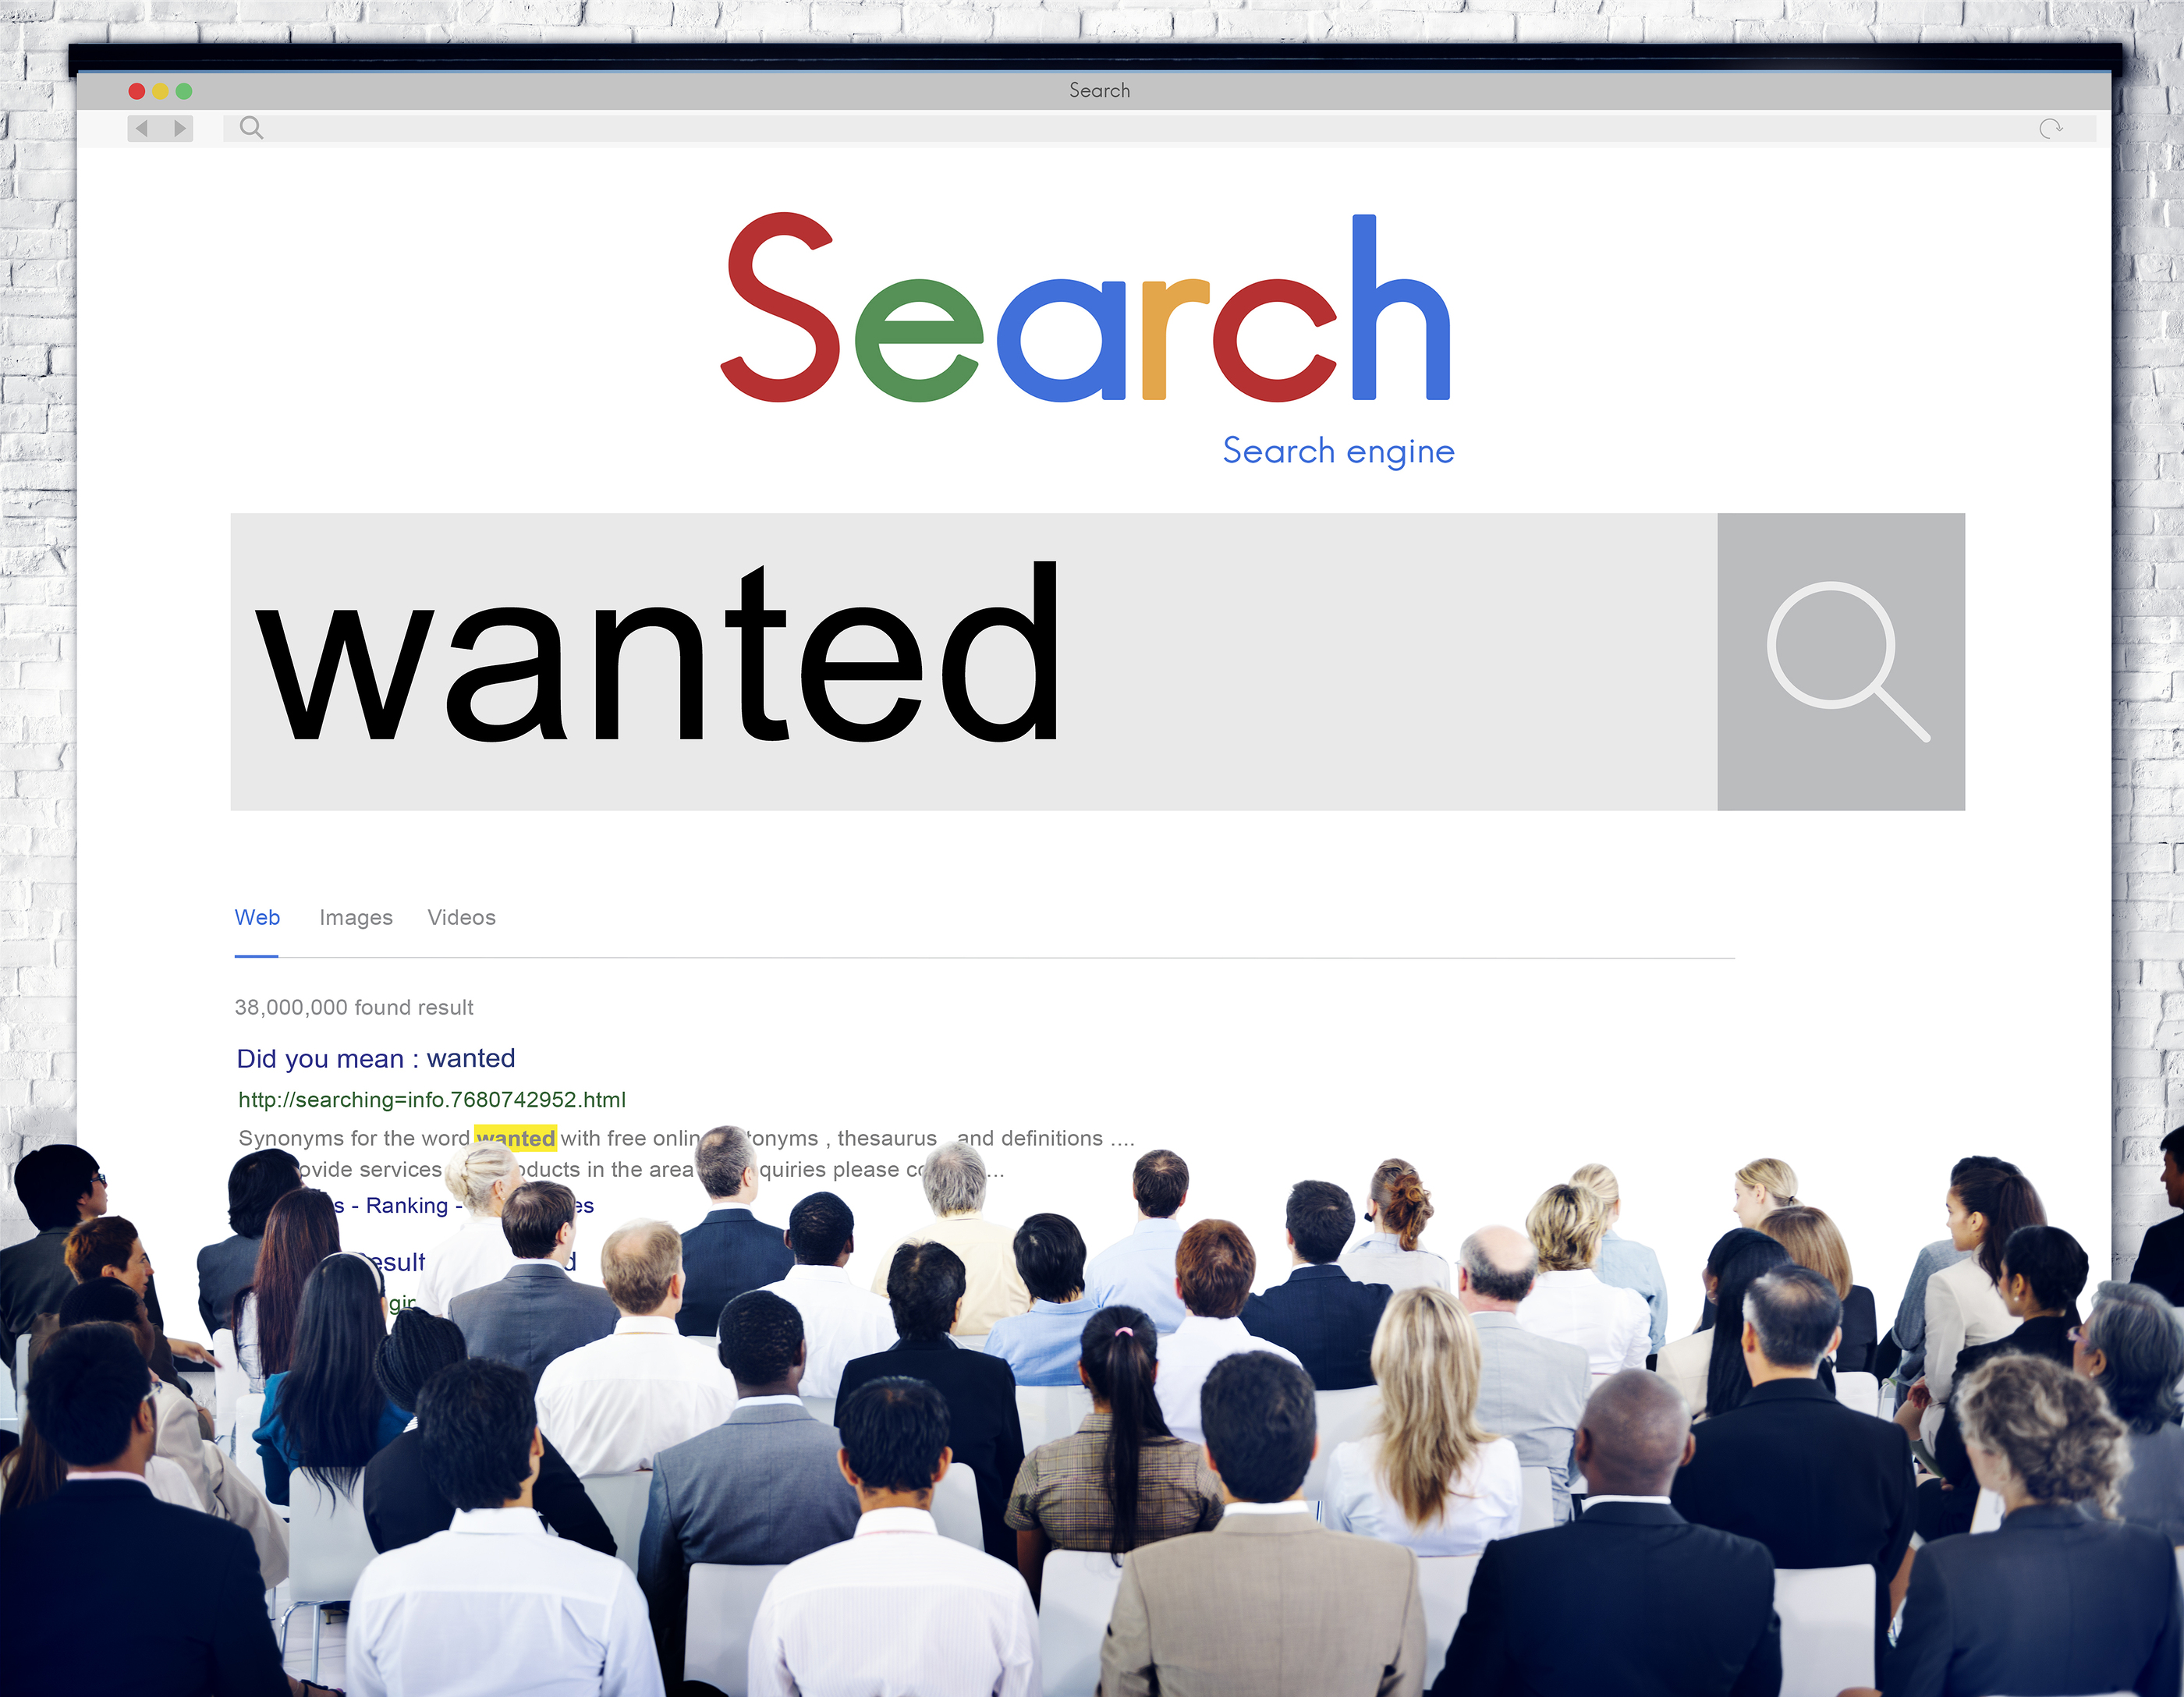 Wanted: Fachkräftemangel hemmt Unternehmen  (Foto: People Grow Personalberatung / Bigstock)